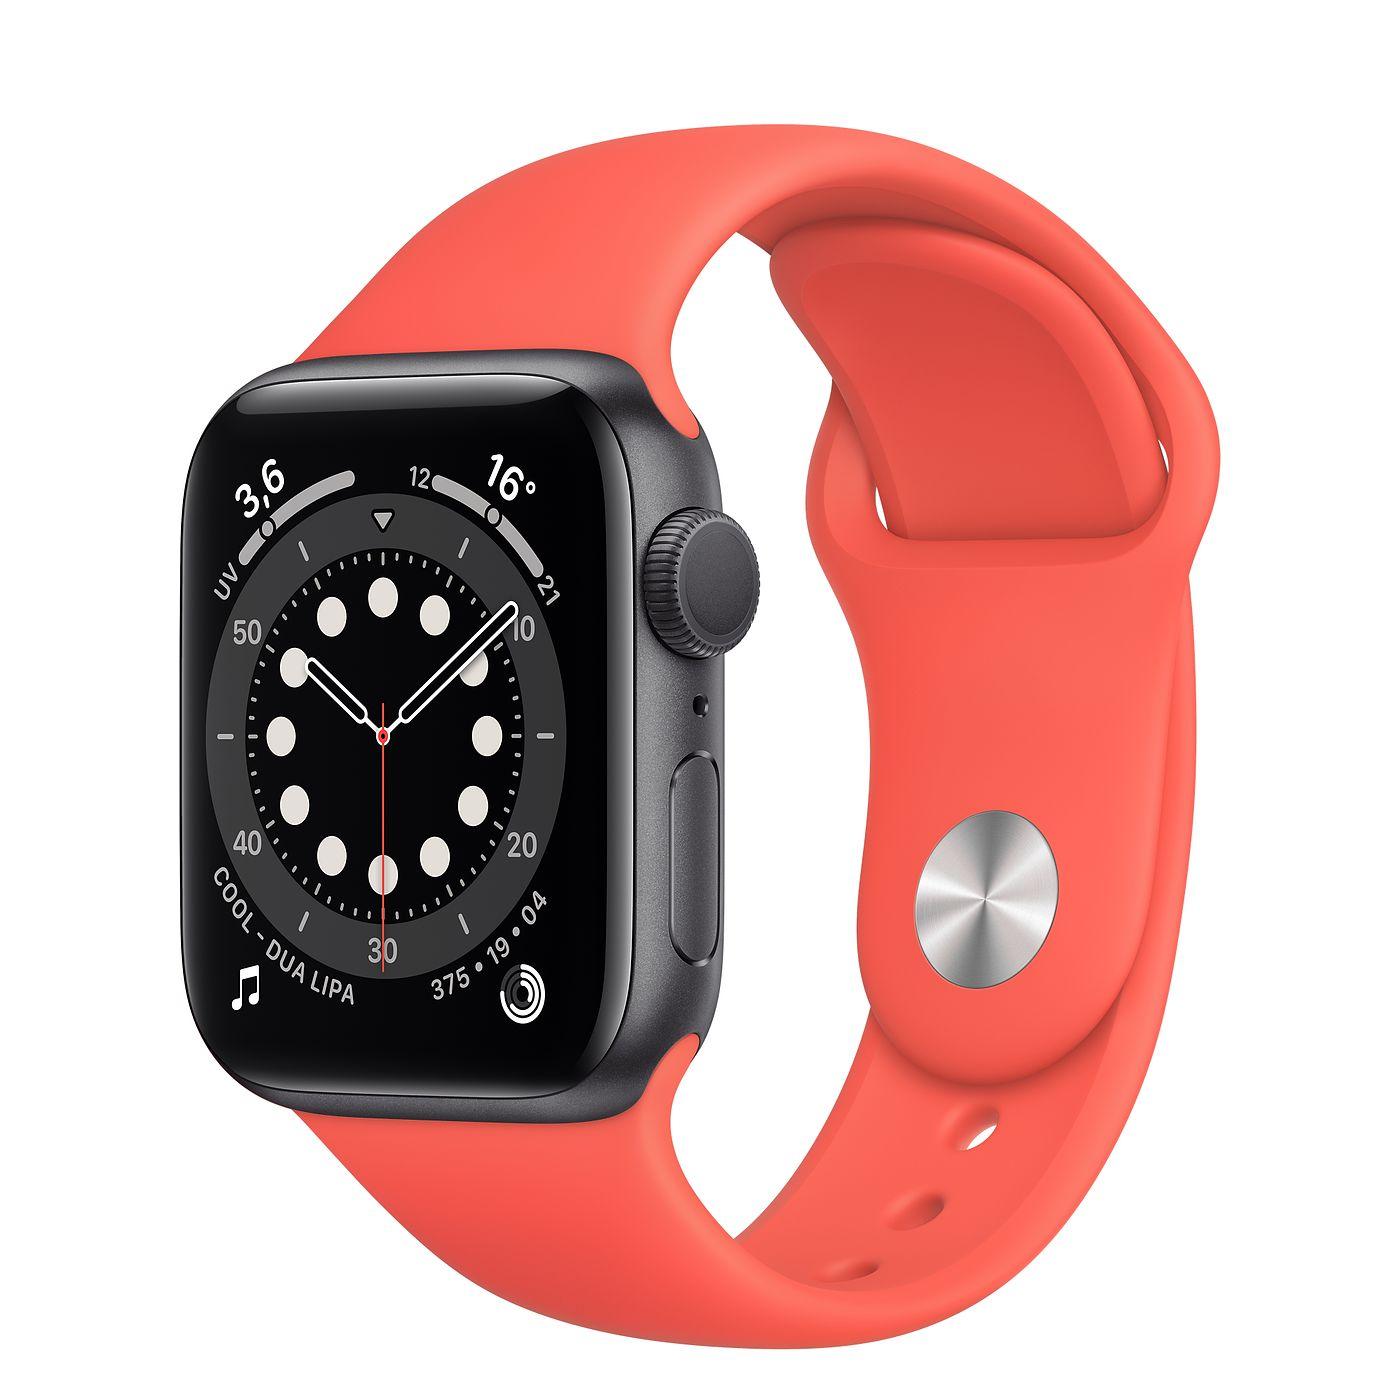 MYAT2_VW_34FR+watch-40-alum-spacegray-nc-6s_VW_34FR_WF_CO_GEO_FR